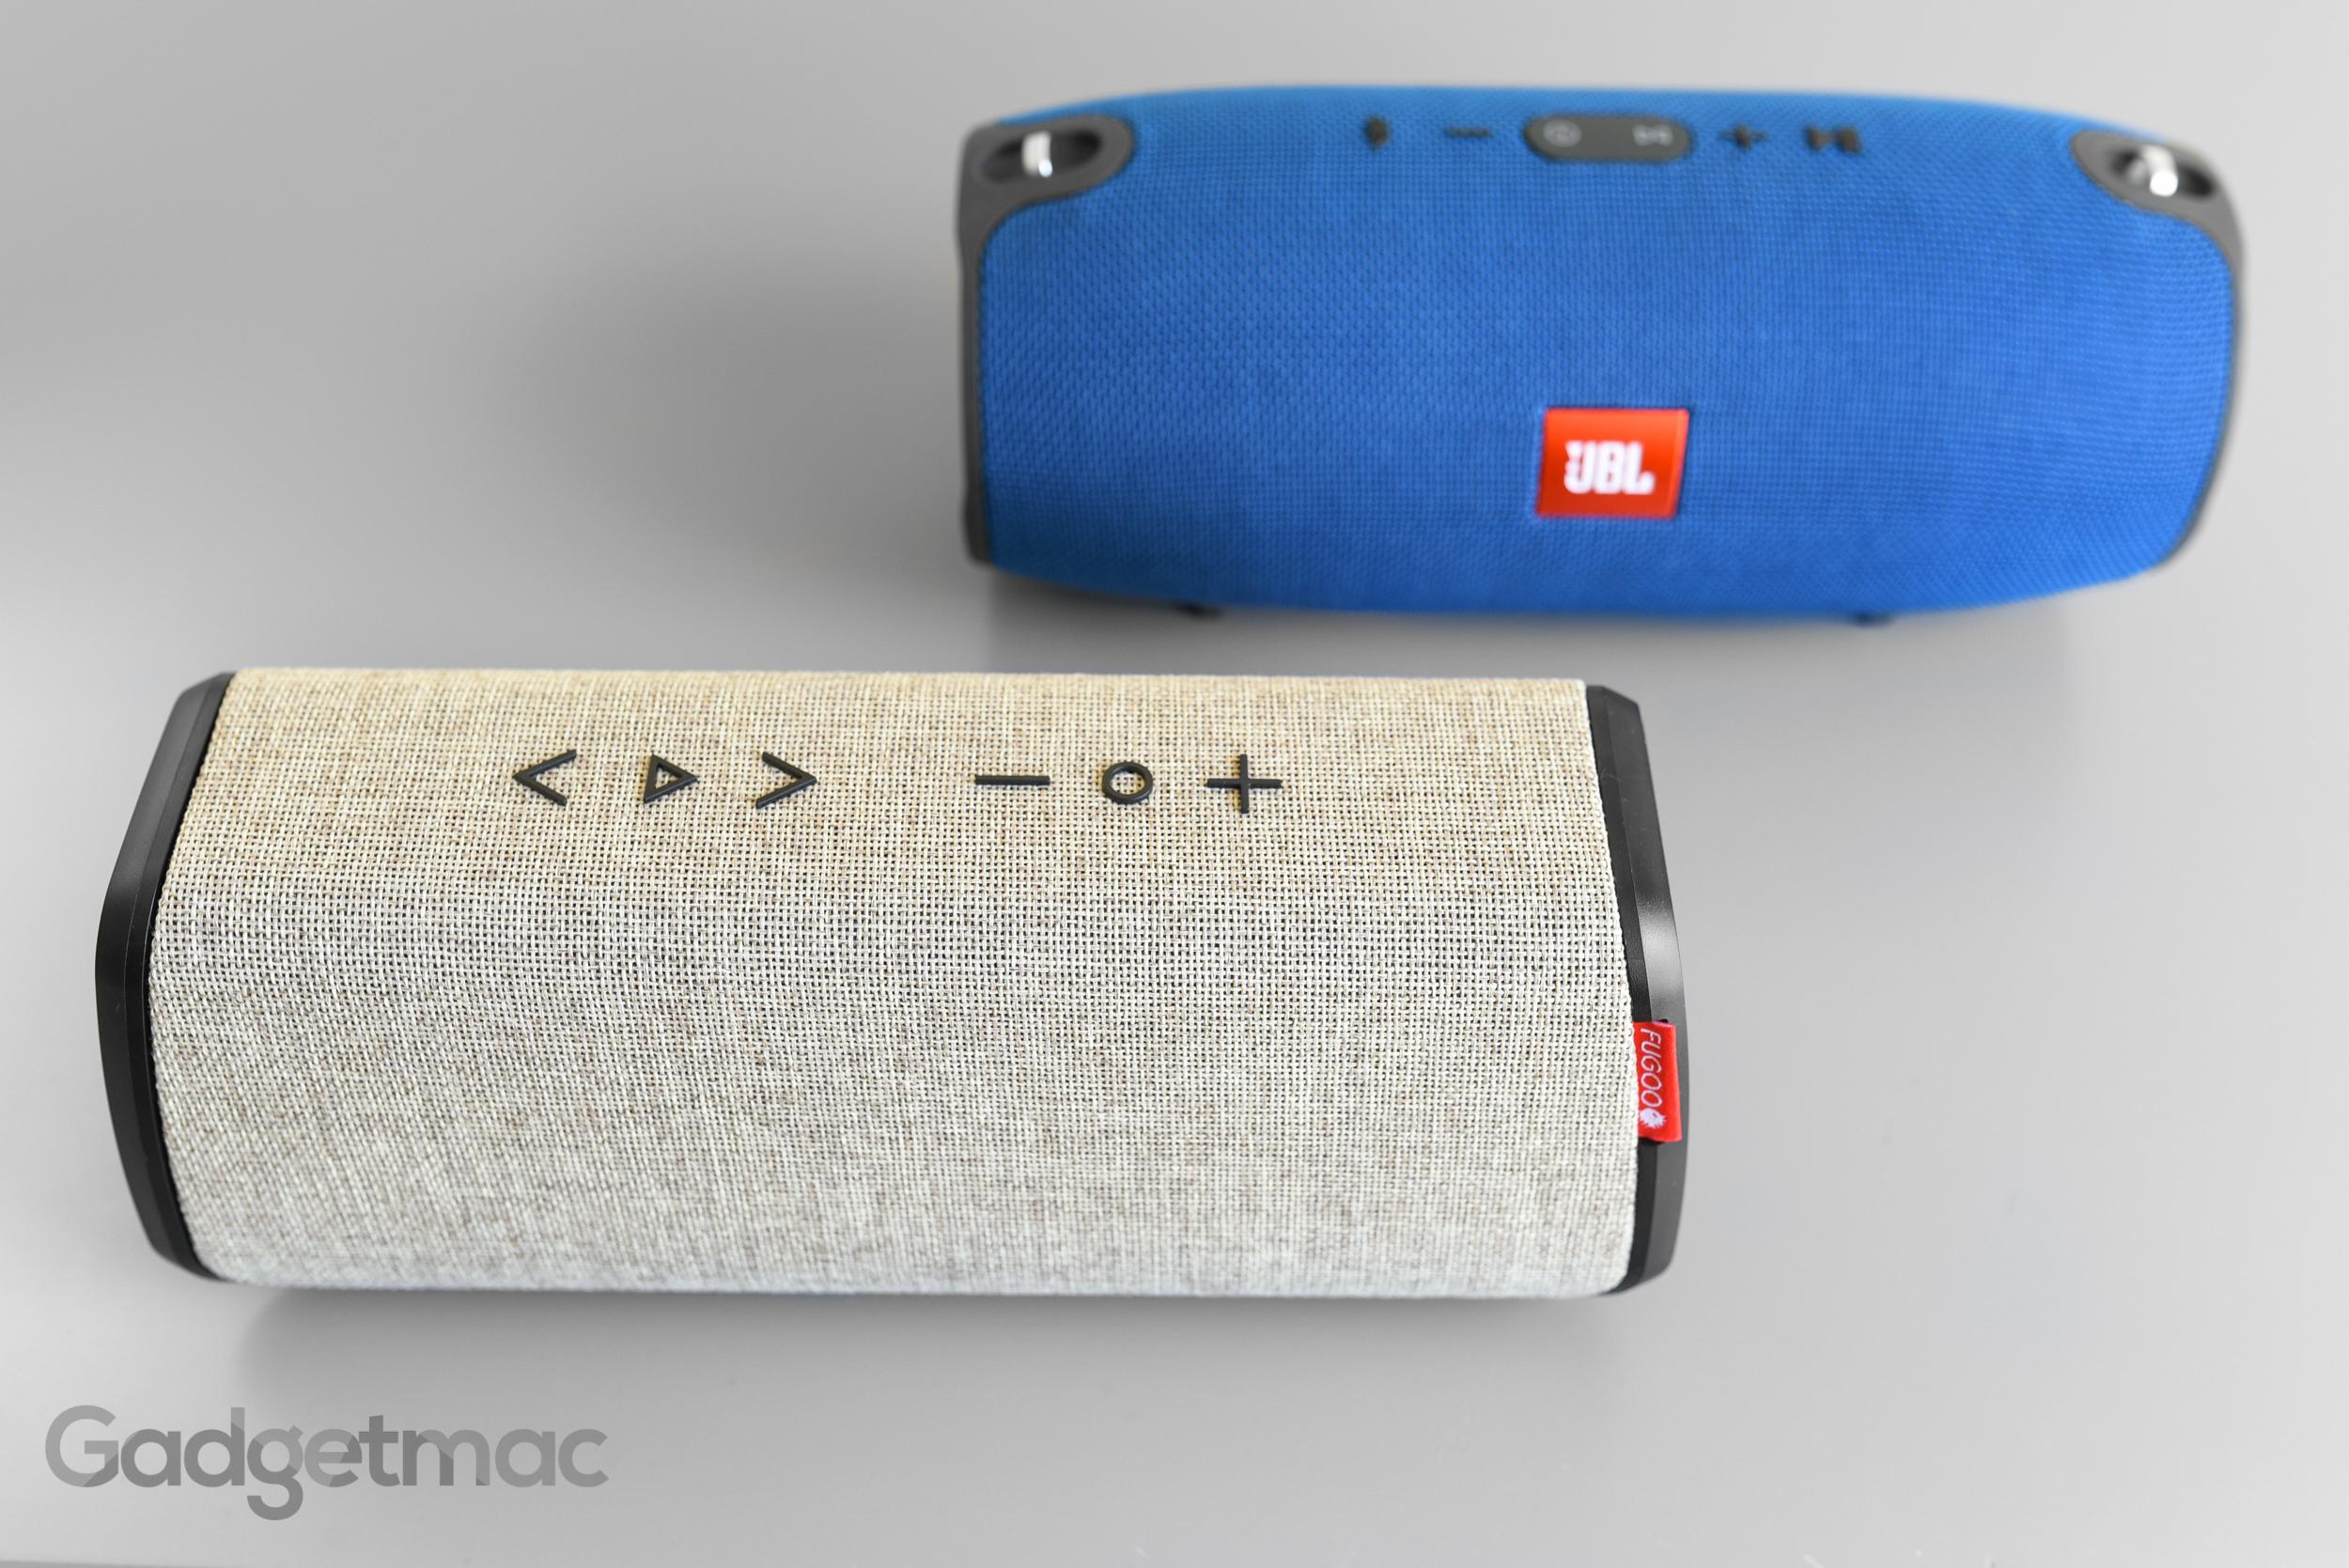 fugoo-style-xl-vs-jbl-xtreme-portable-speaker-1.jpg